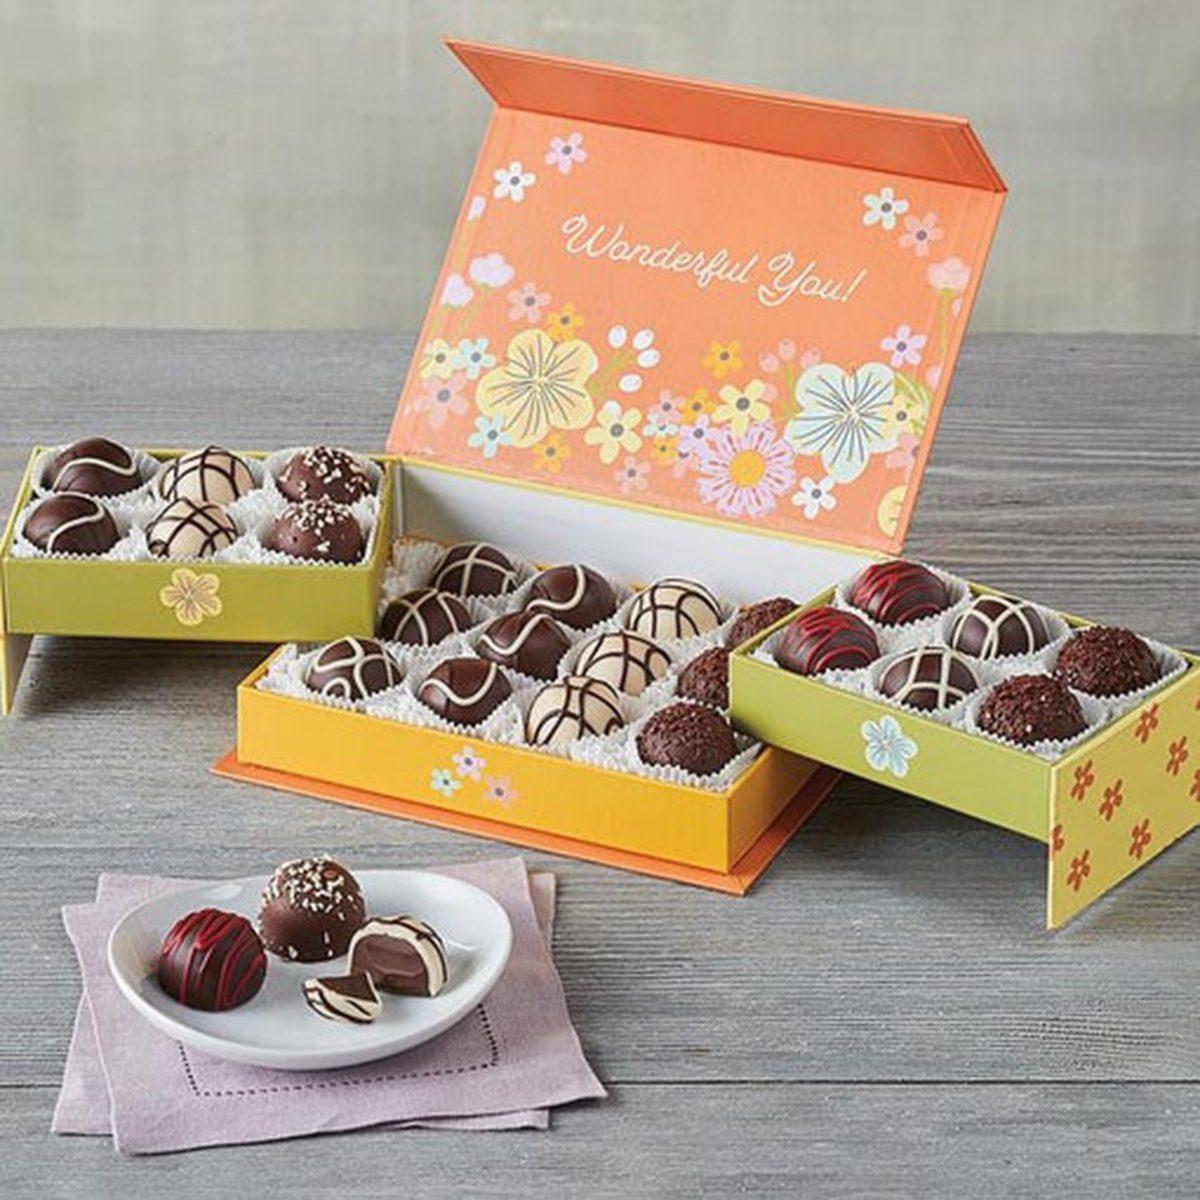 Mother's Day Keepsake Box with Chocolate Truffles